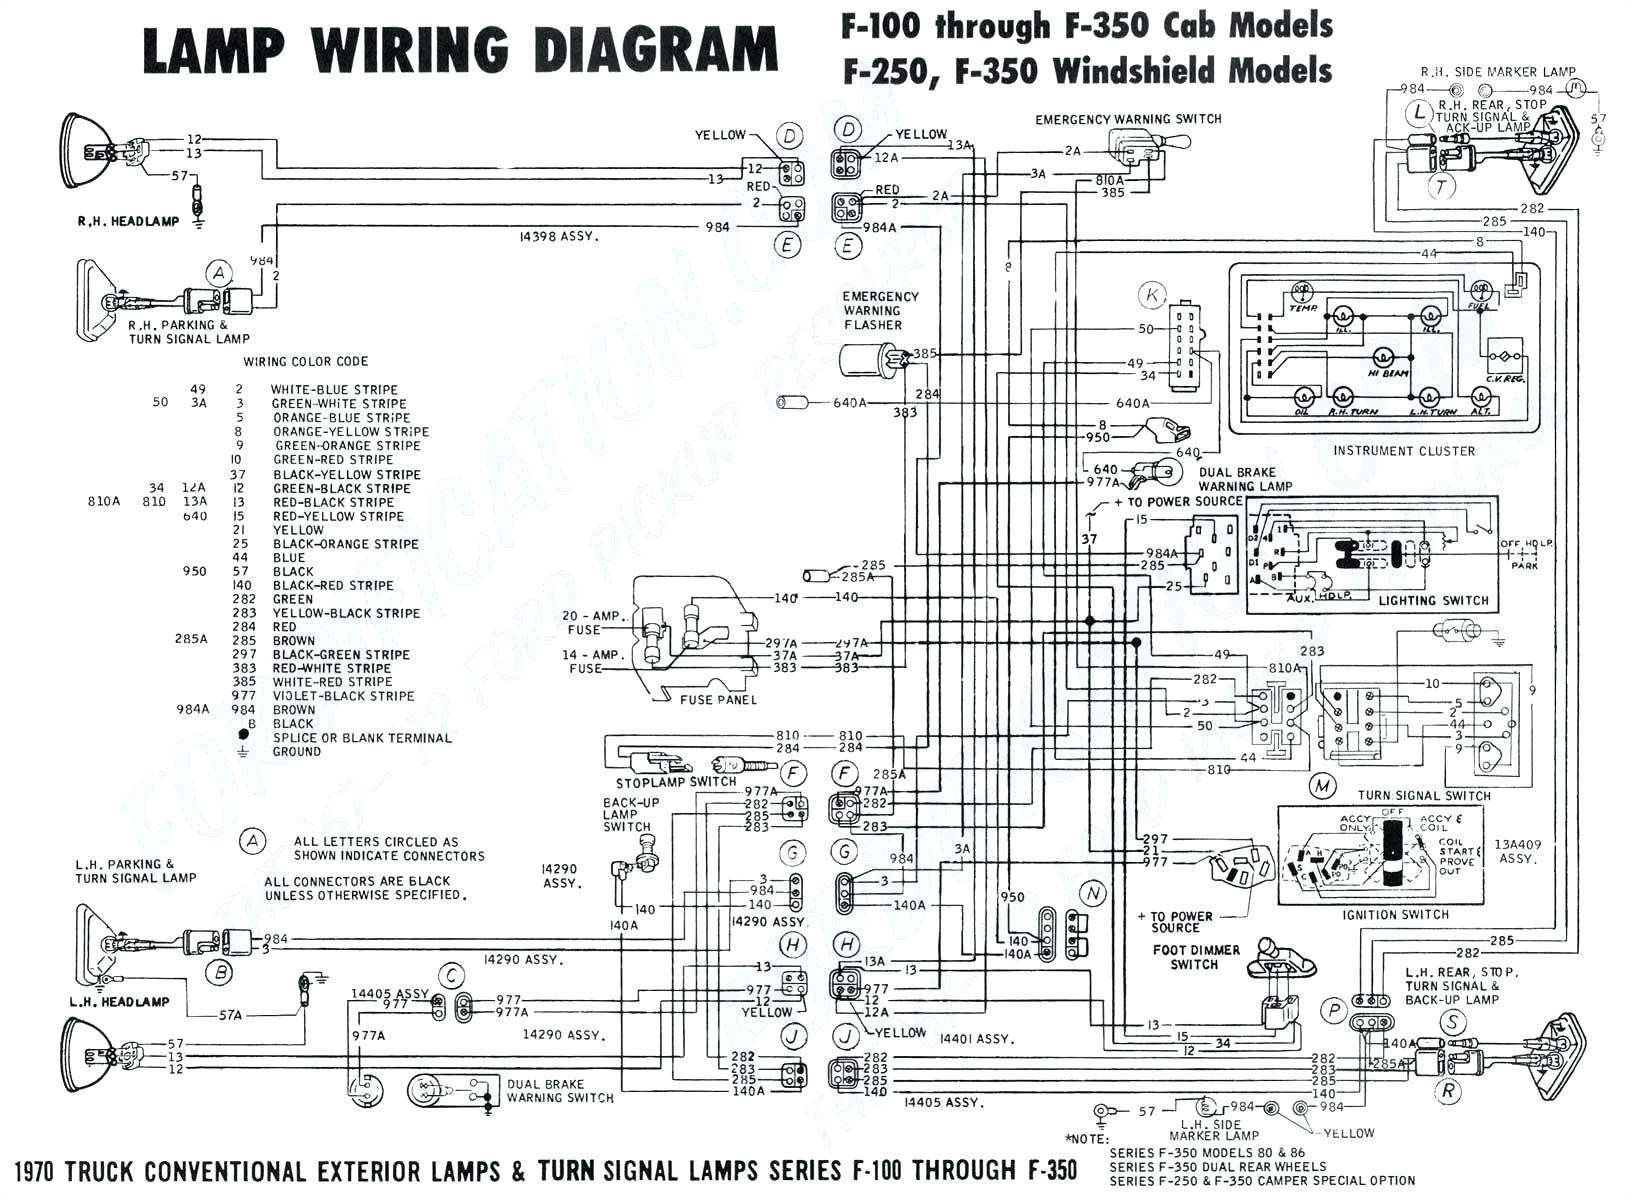 ford f250 starter solenoid wiring diagram 1996 f150 trailer wiring diagram anything wiring diagrams u2022 rh johnparkinson me 96 f150 wiring diagram 12c jpg